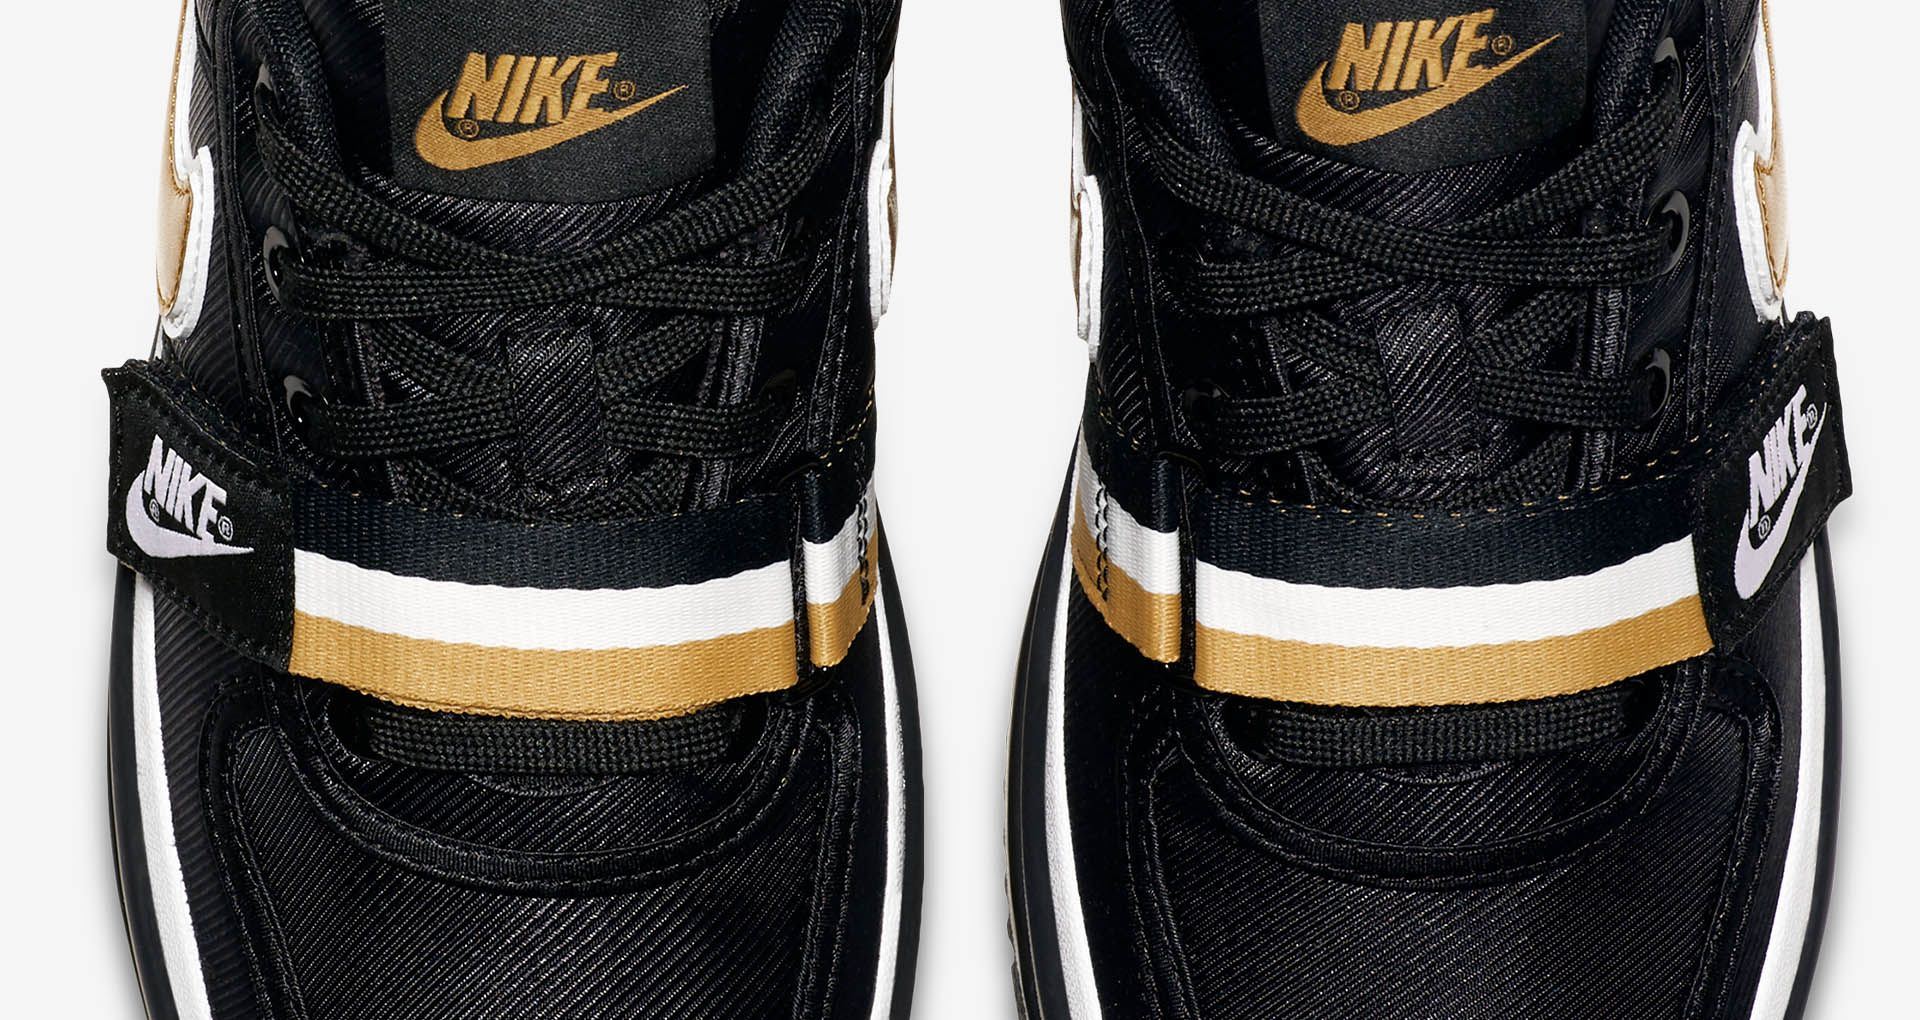 0d916bb0283 Nike Women s Vandal 2K  Black   Metallic Gold  Release Date. Nike+ ...